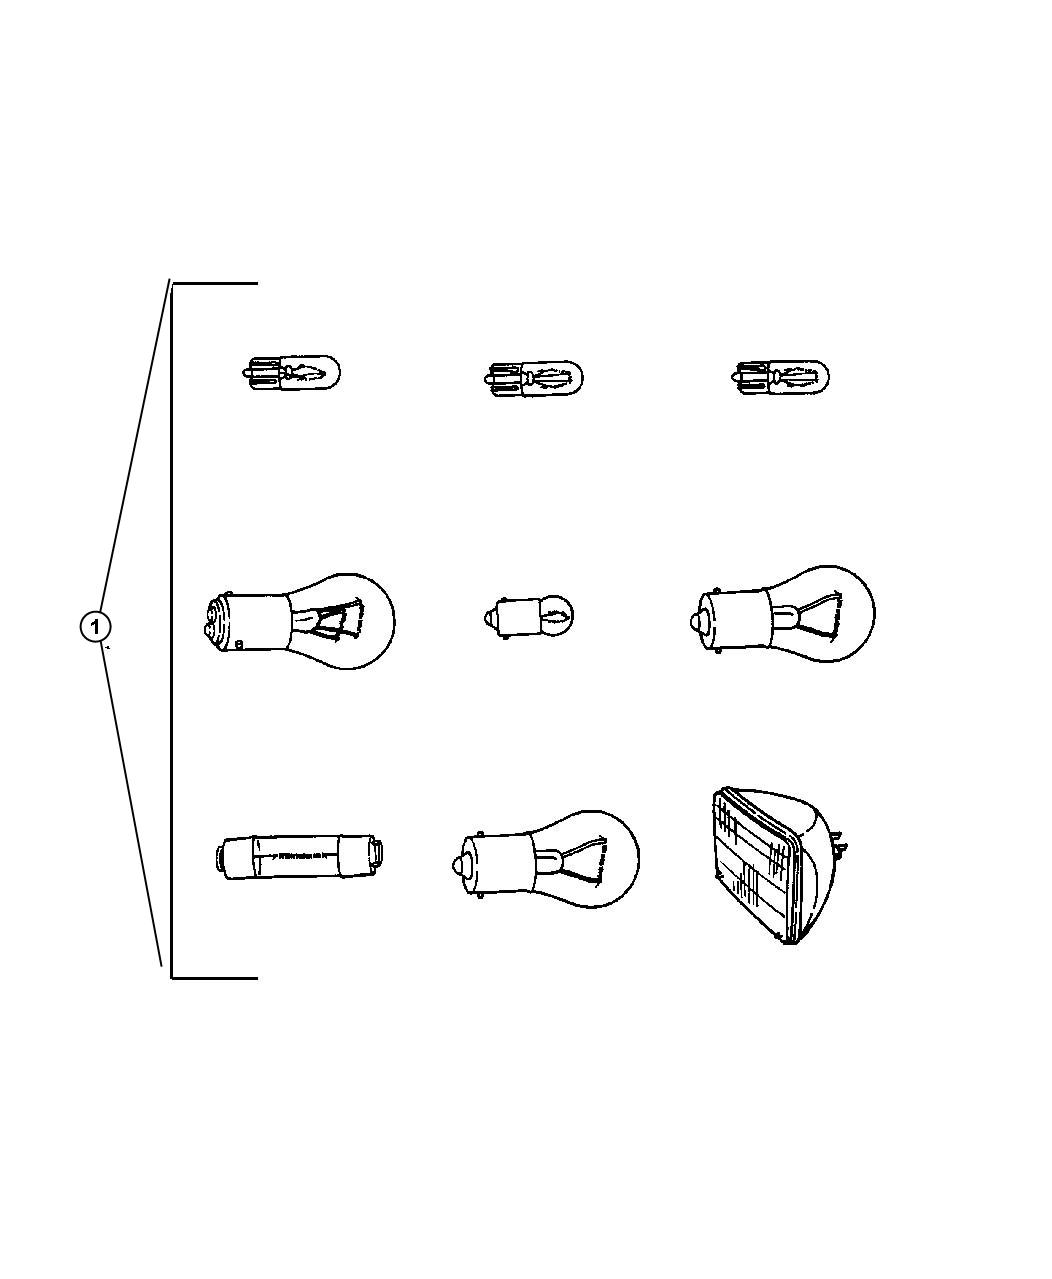 Chrysler 200 Bulb 567 Trim All Trim Codes Flood